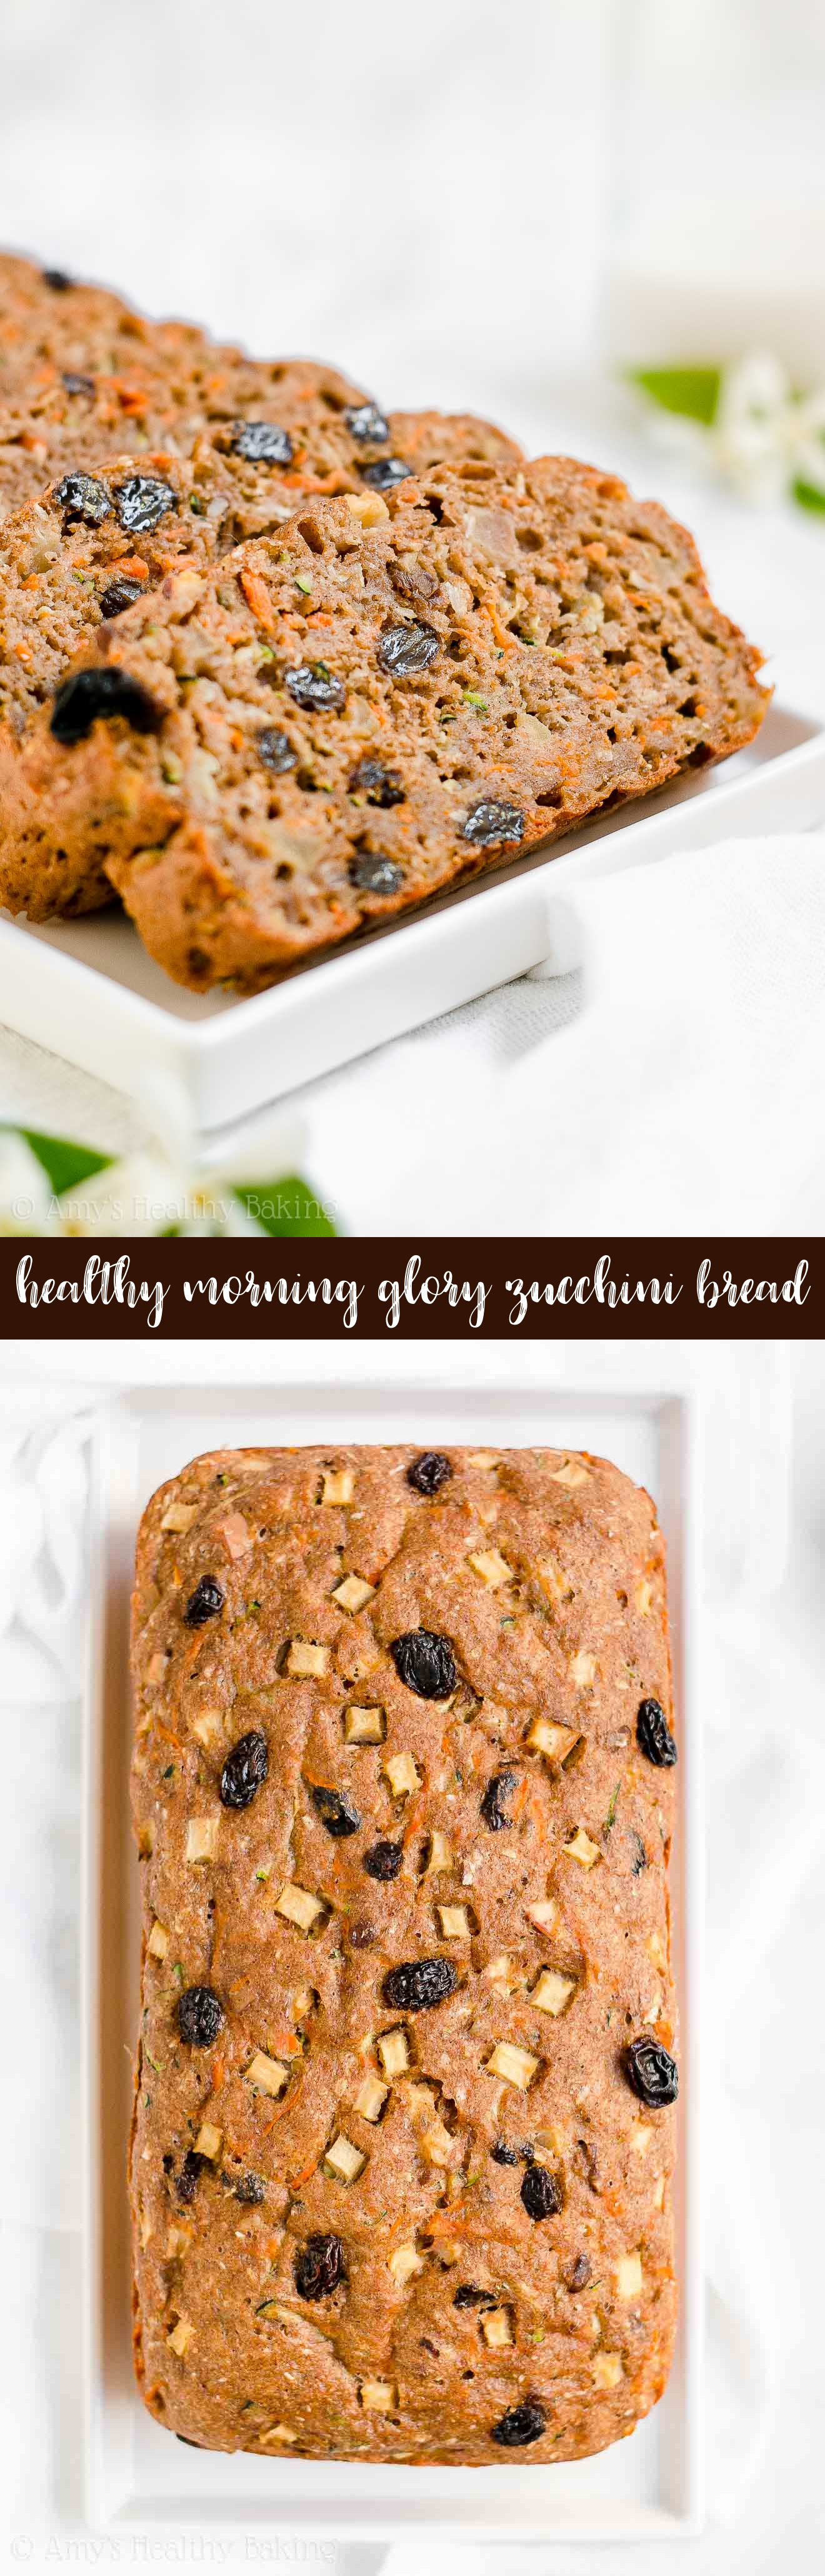 Best Healthy Greek Yogurt Morning Glory Zucchini Bread